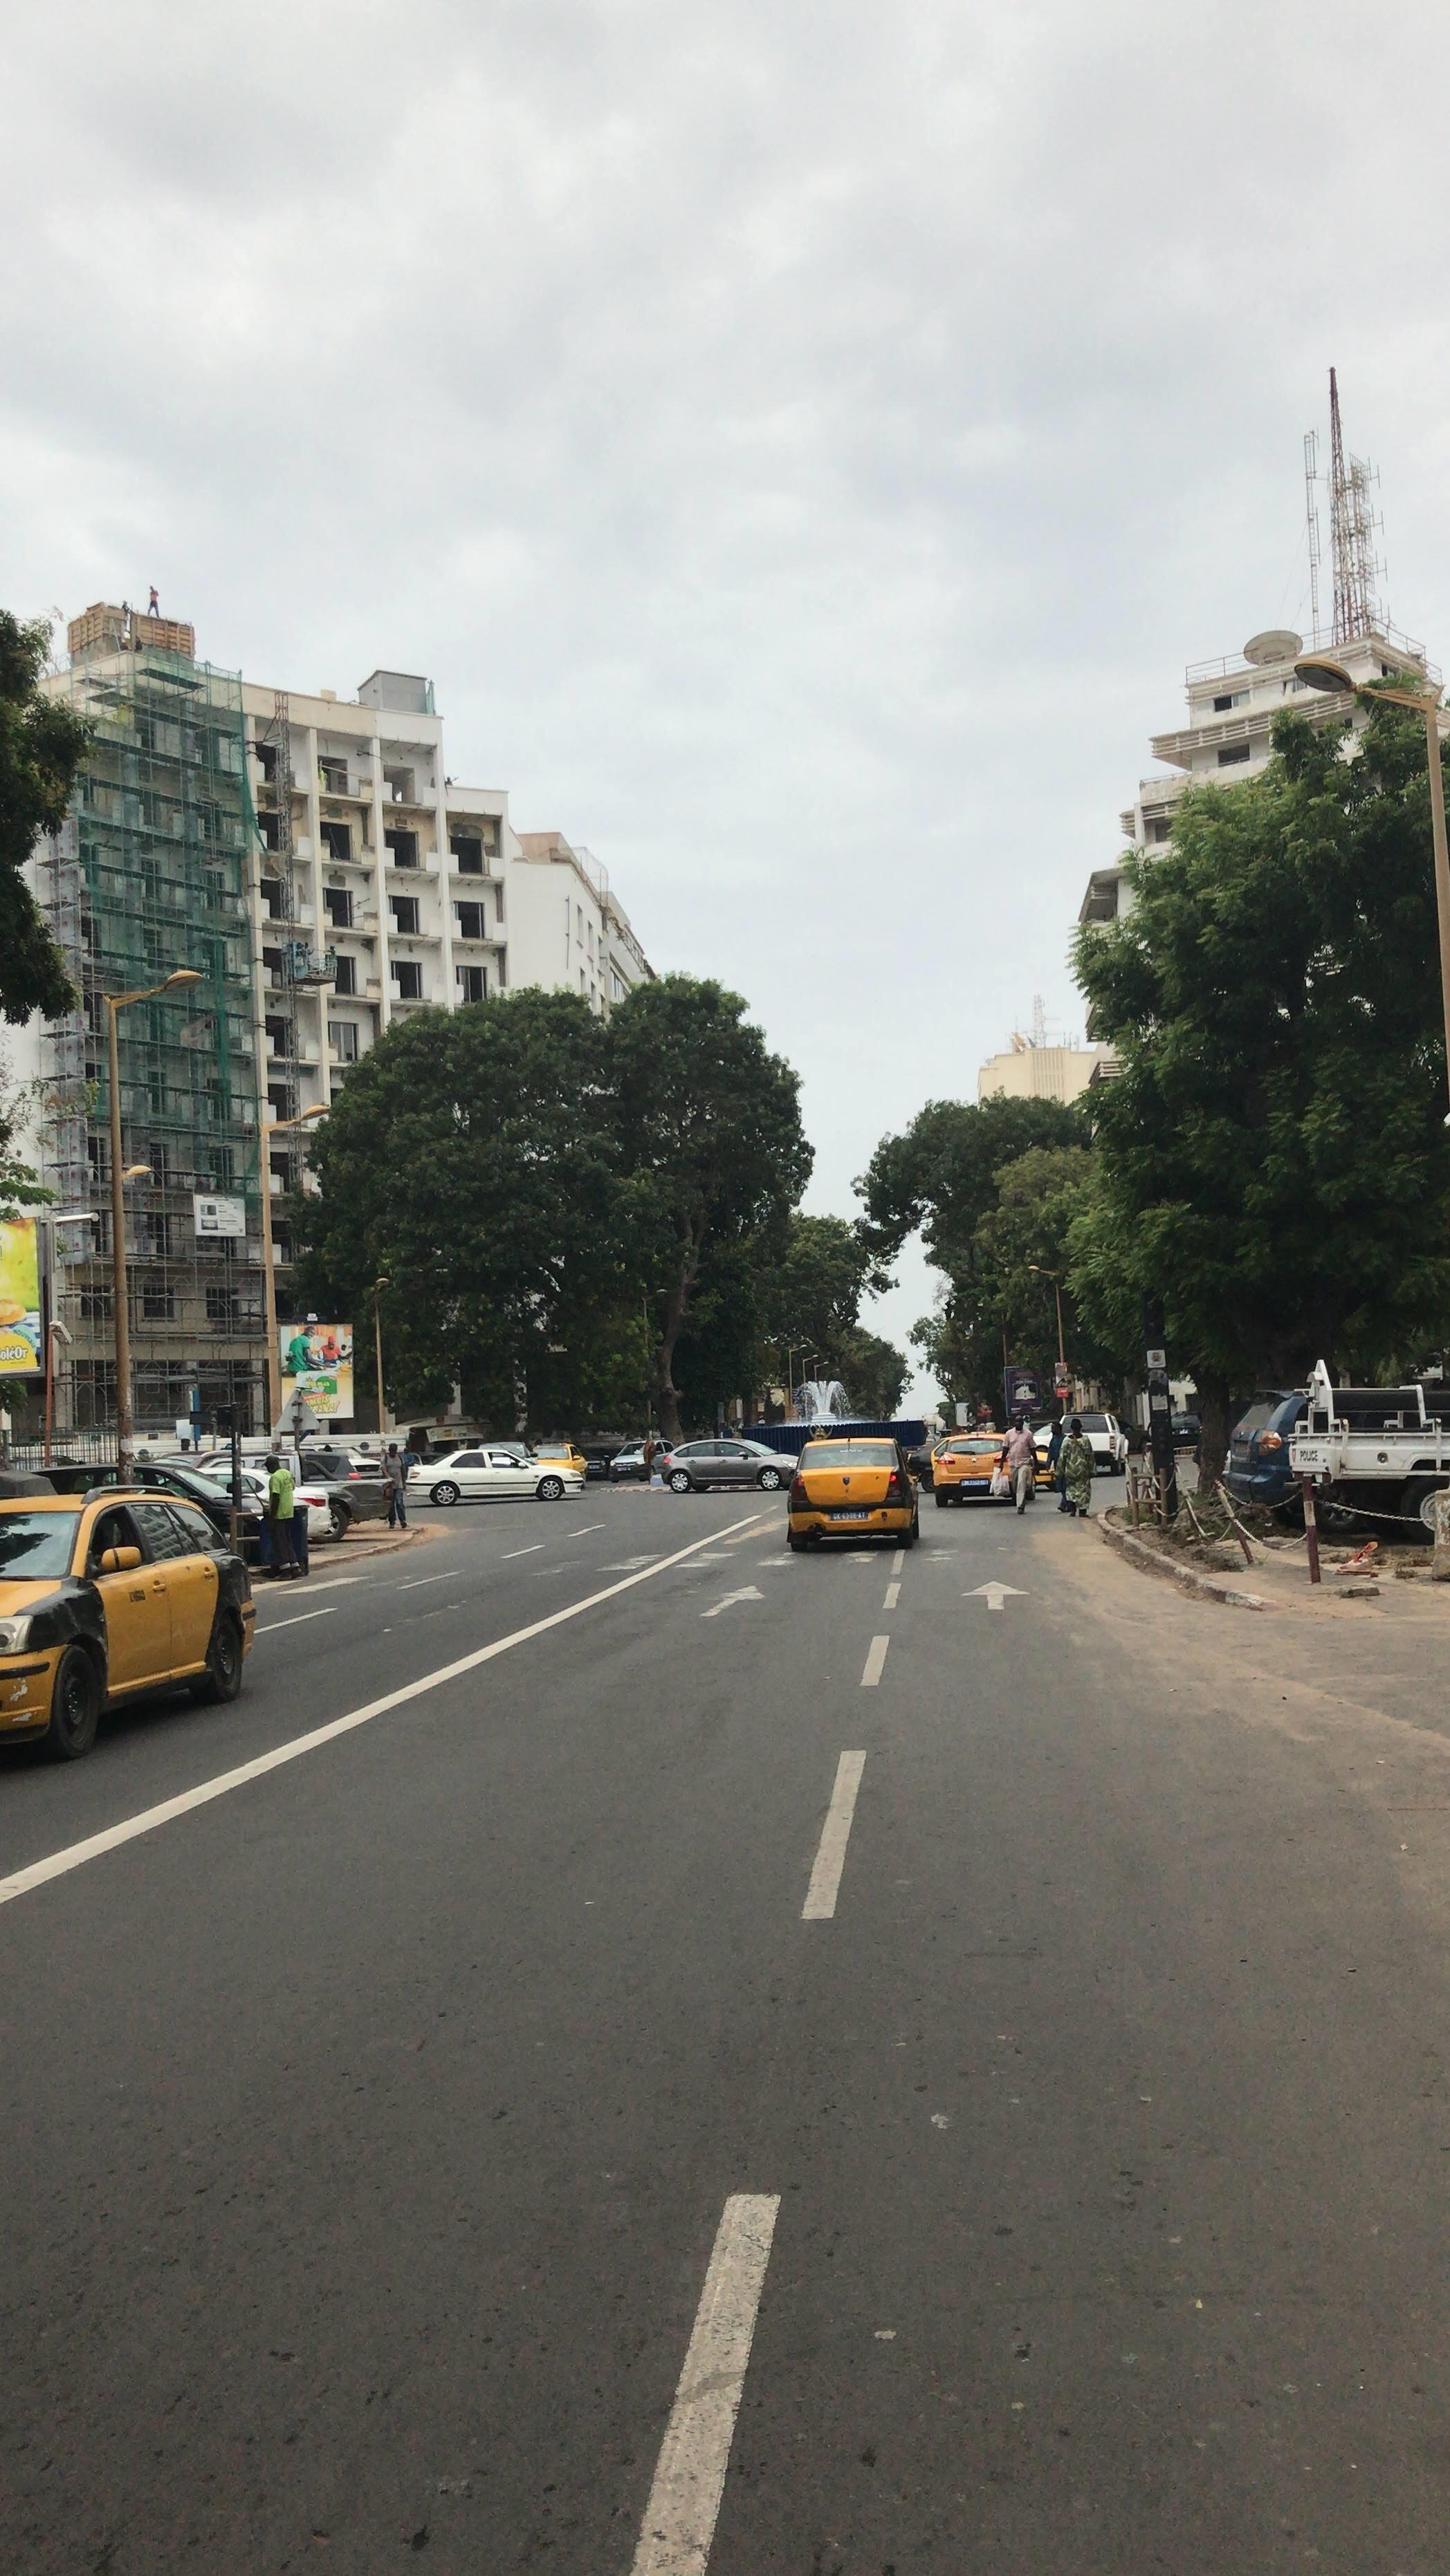 The streets of the Senegalese capital Dakar